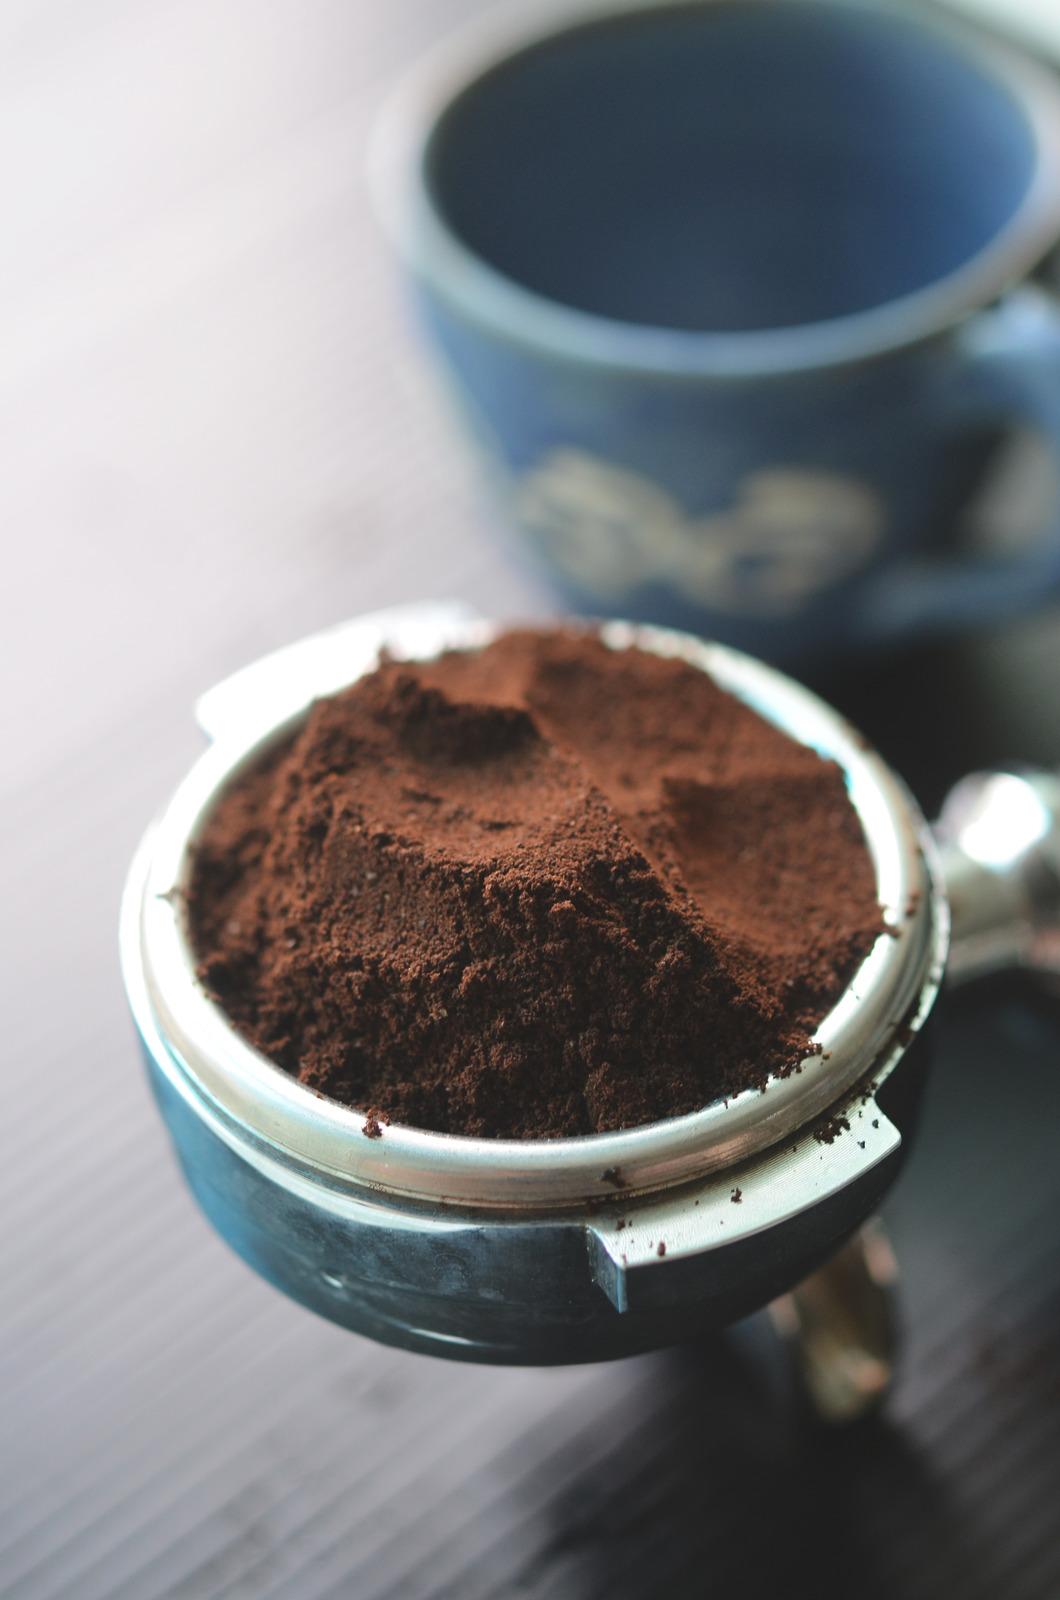 canva-coffee-powder-MADGxzJz-L0.jpg